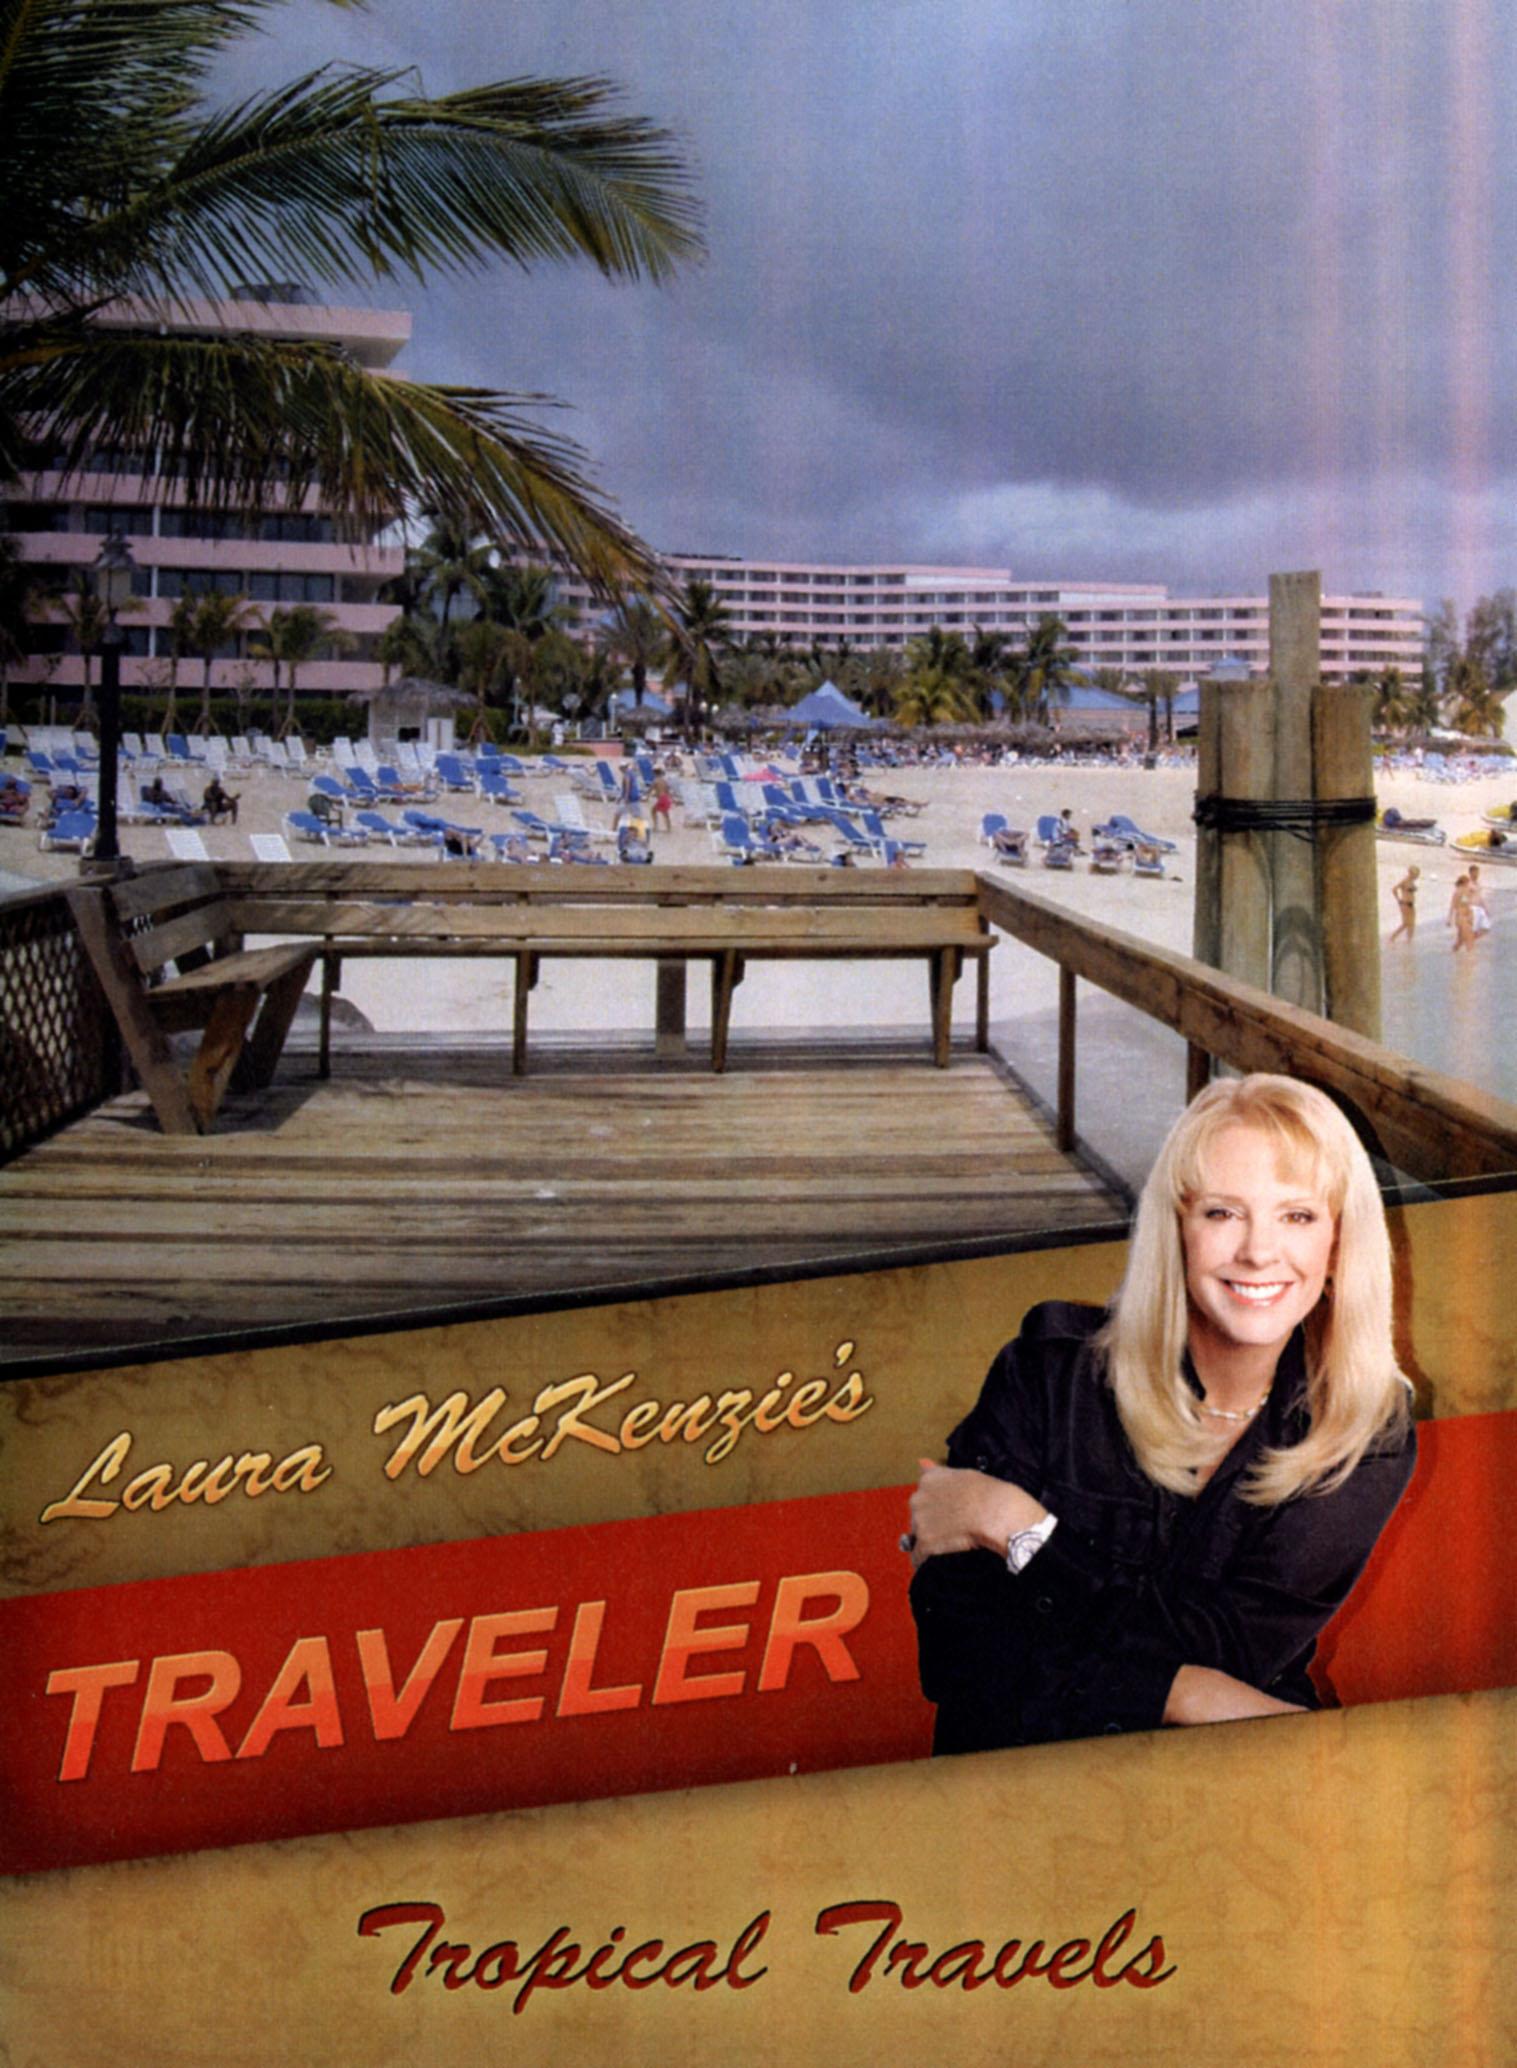 Laura McKenzie's Traveler: Tropical Travels